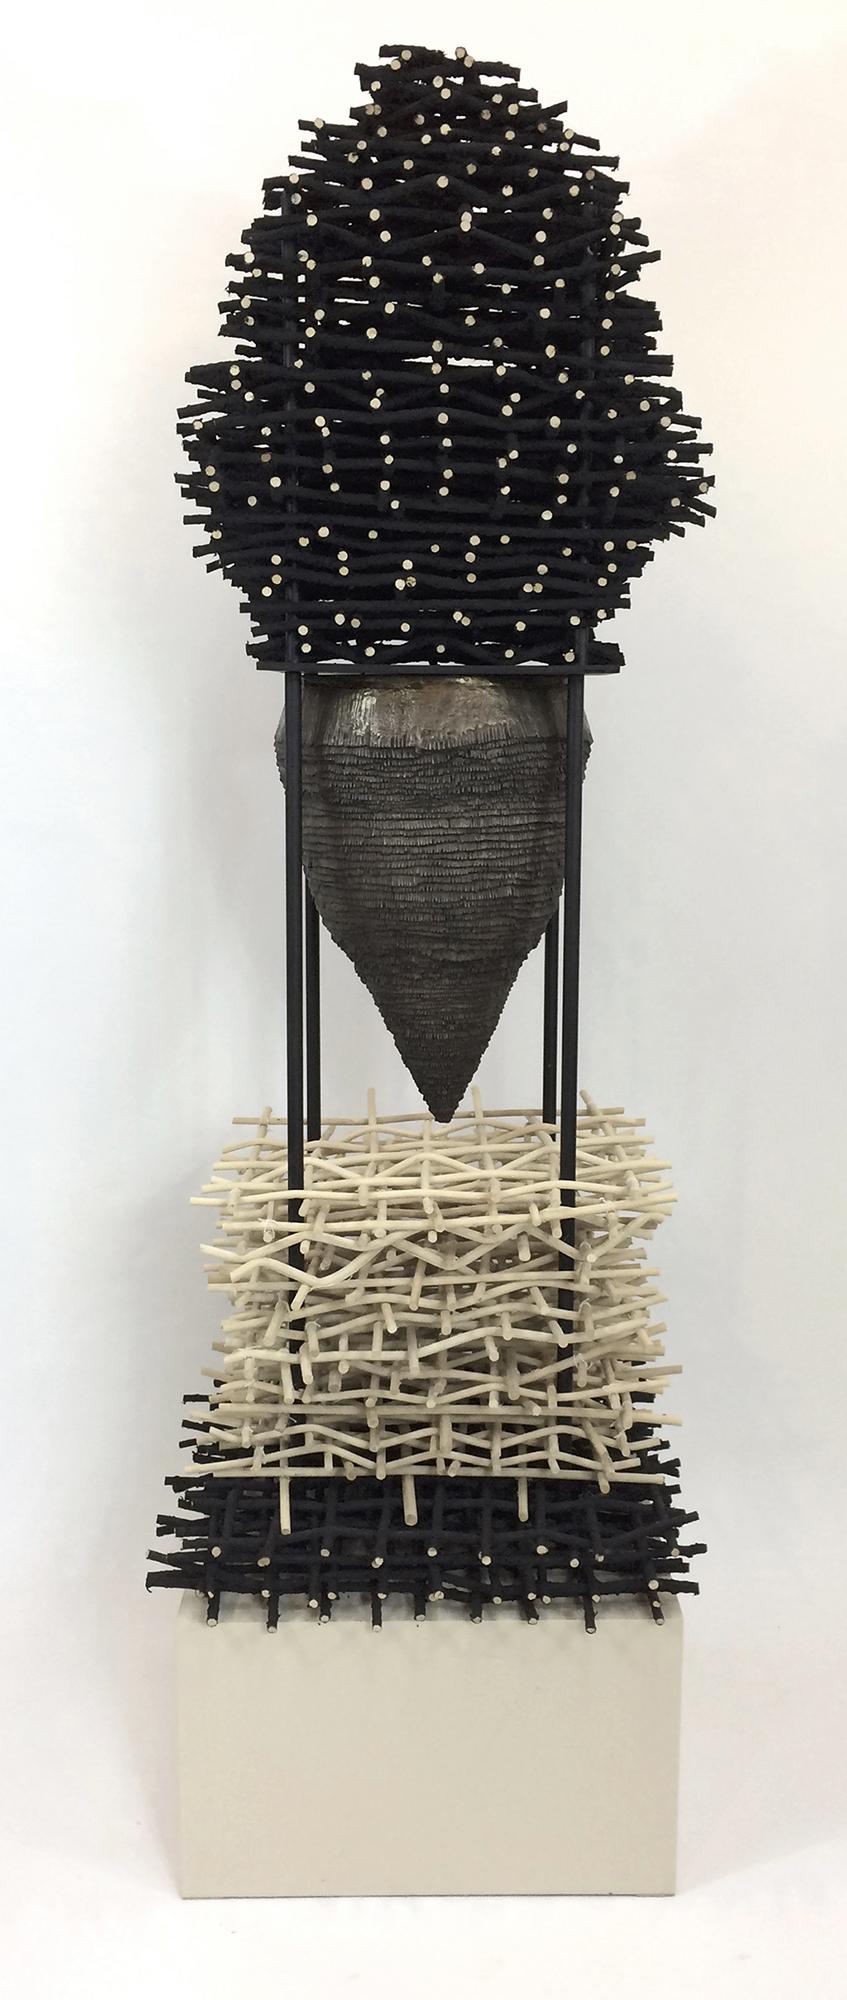 Nesting : Tolerance